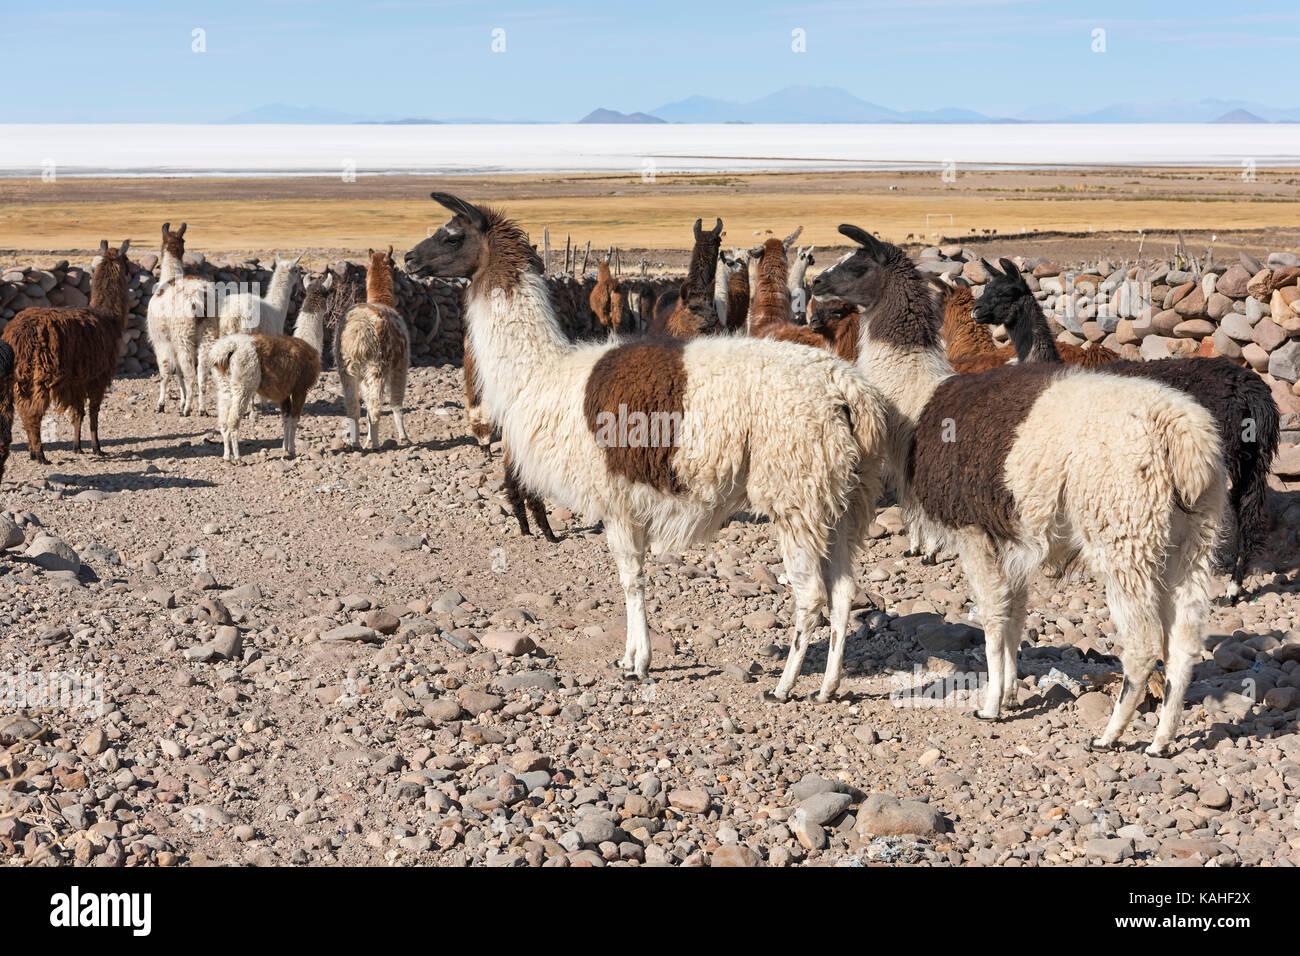 Llamas (Lama glama), herd in barren landscape, Altiplano, Colchani, Potosí, Bolivia - Stock Image